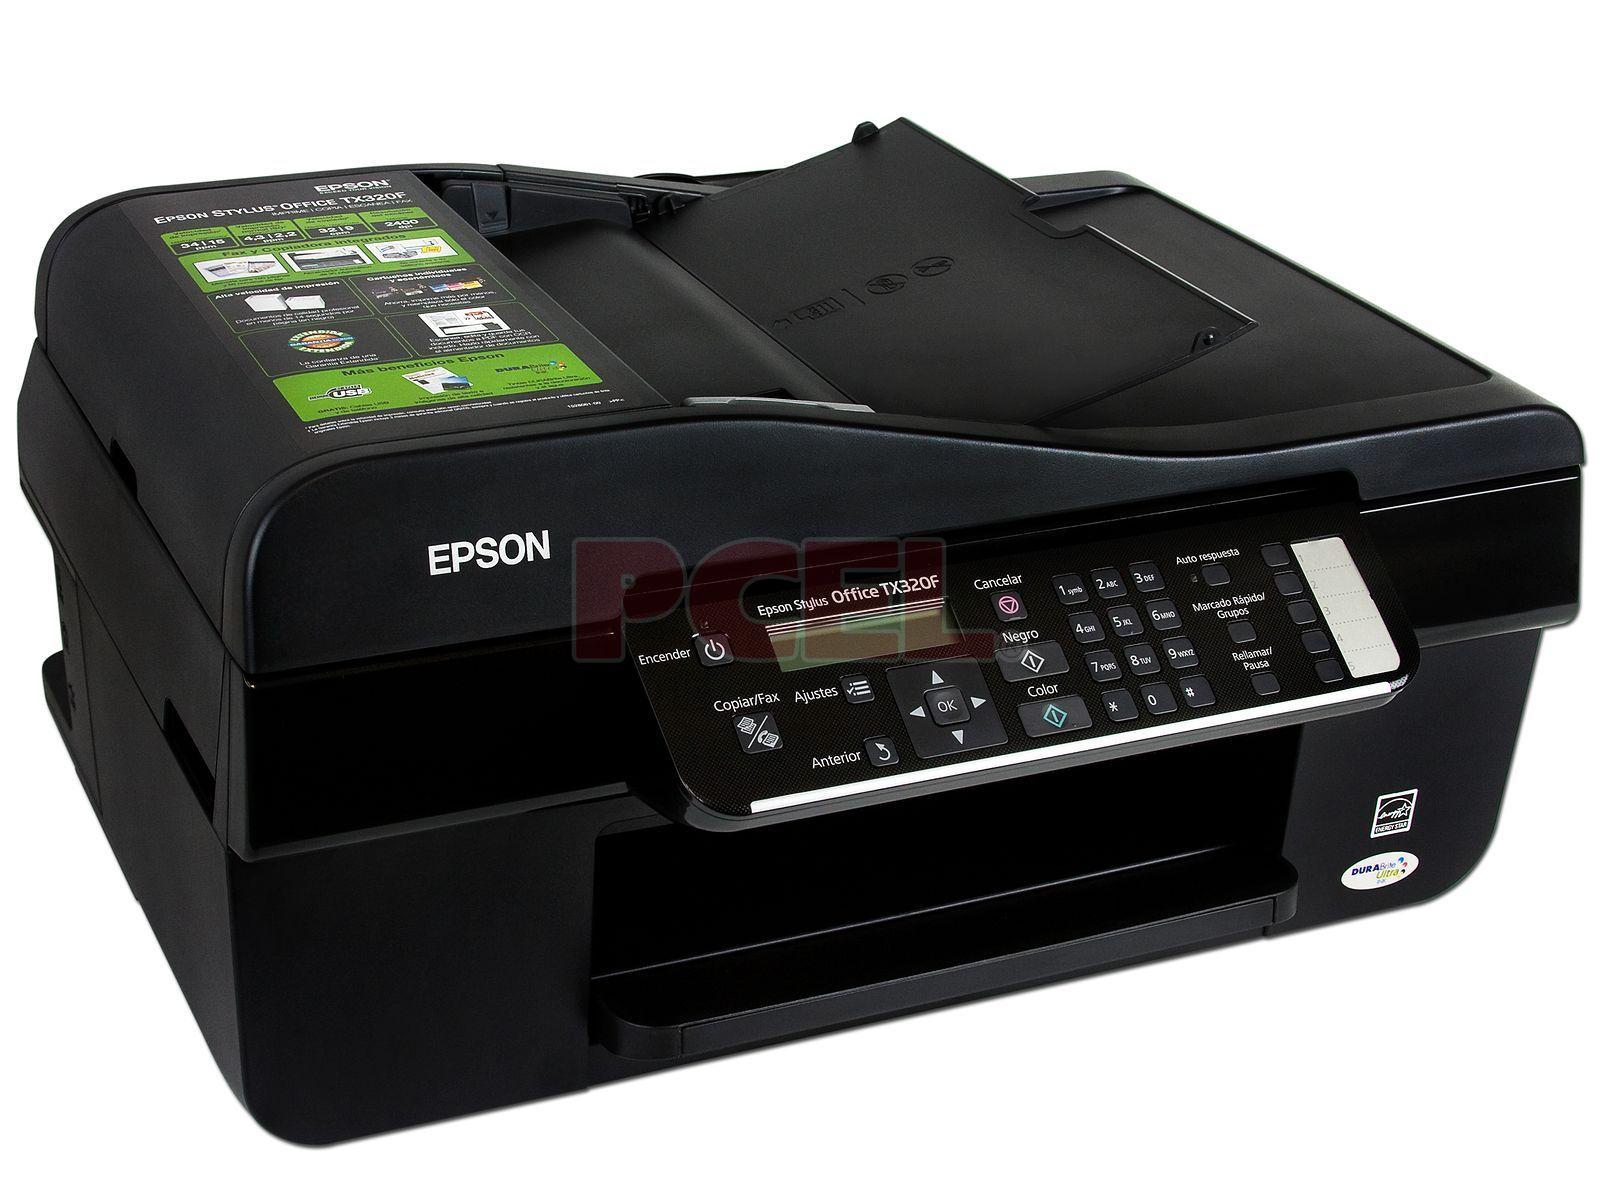 EPSON TX320 WINDOWS 10 DRIVER